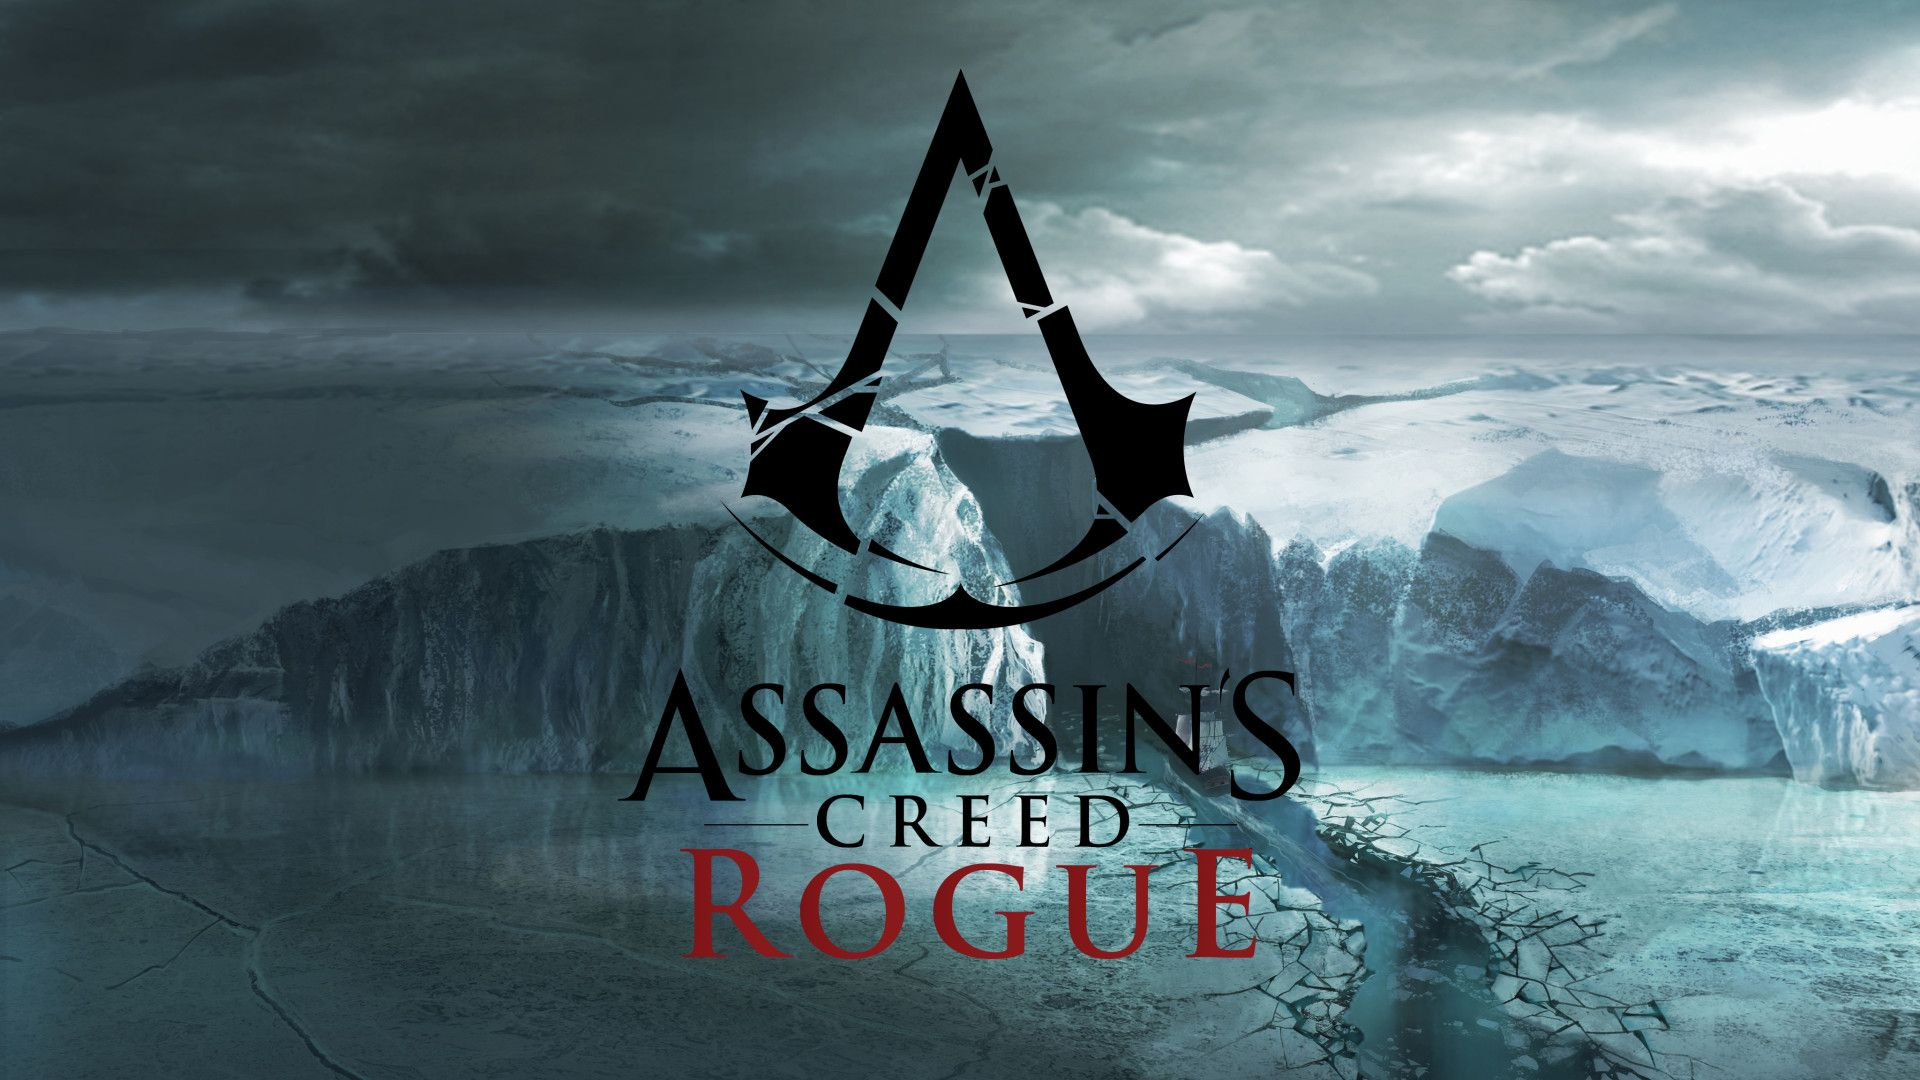 Assassin S Creed Rogue Wallpaper Assassins Creed Rogue Jeux Video